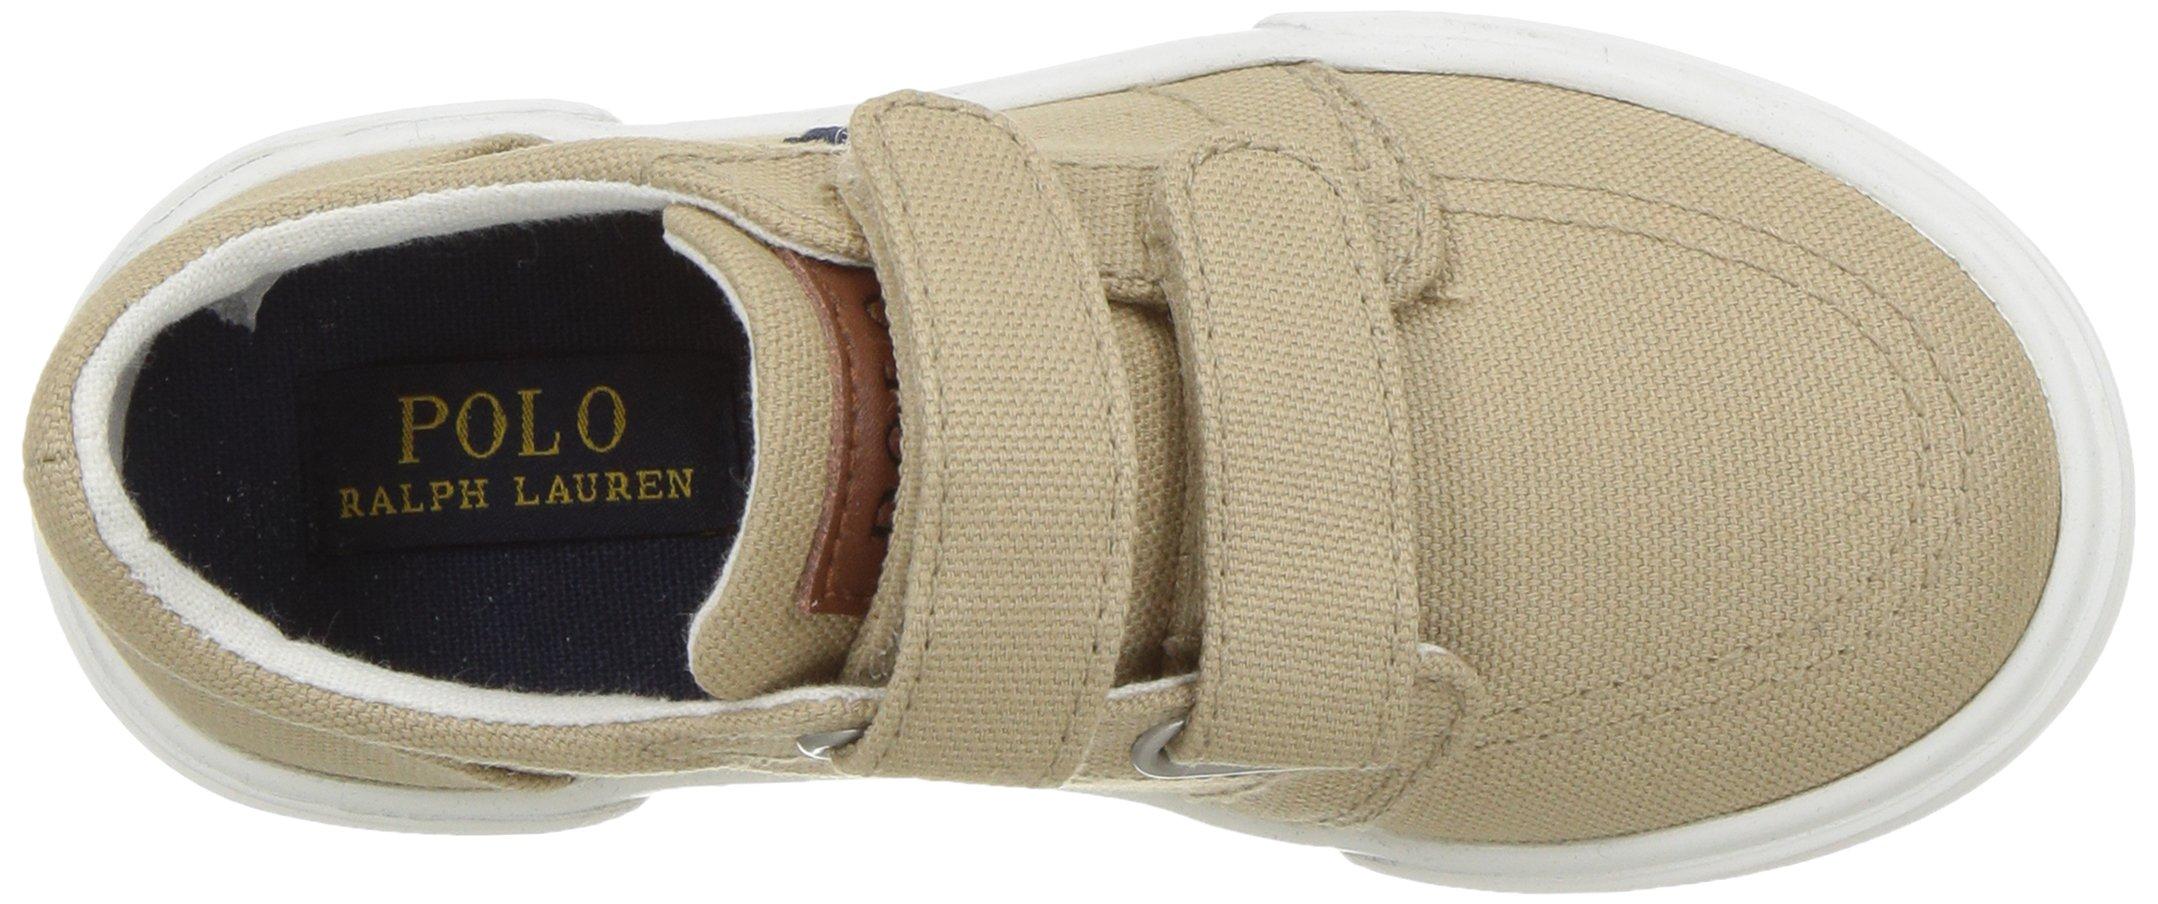 Polo Ralph Lauren Kids Boys' Faxon II Sneaker, Khaki Cotton, 10 M US Toddler by Polo Ralph Lauren (Image #8)